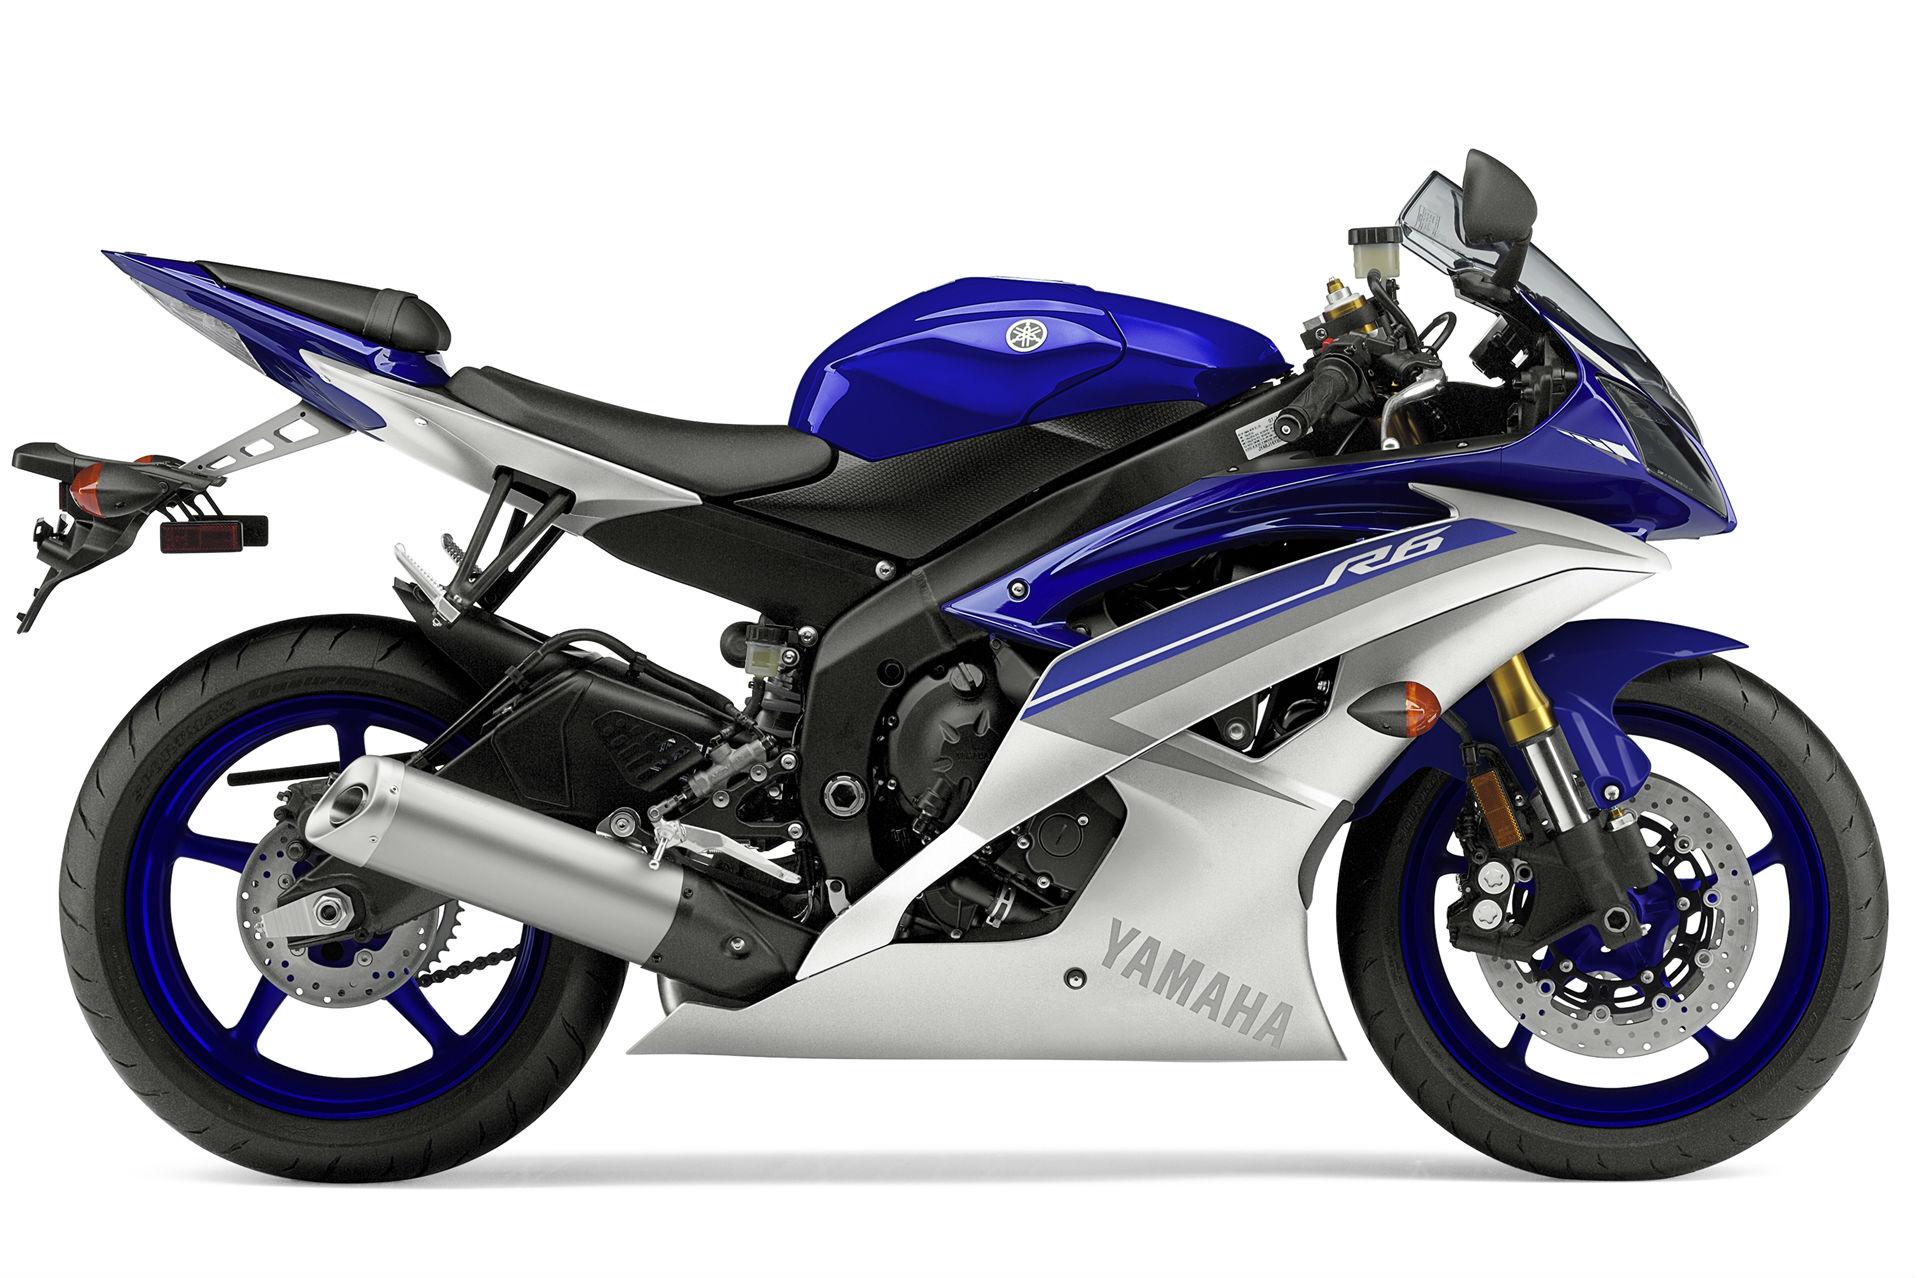 Recall: Yamaha MT-09, R6 and Super Ténéré